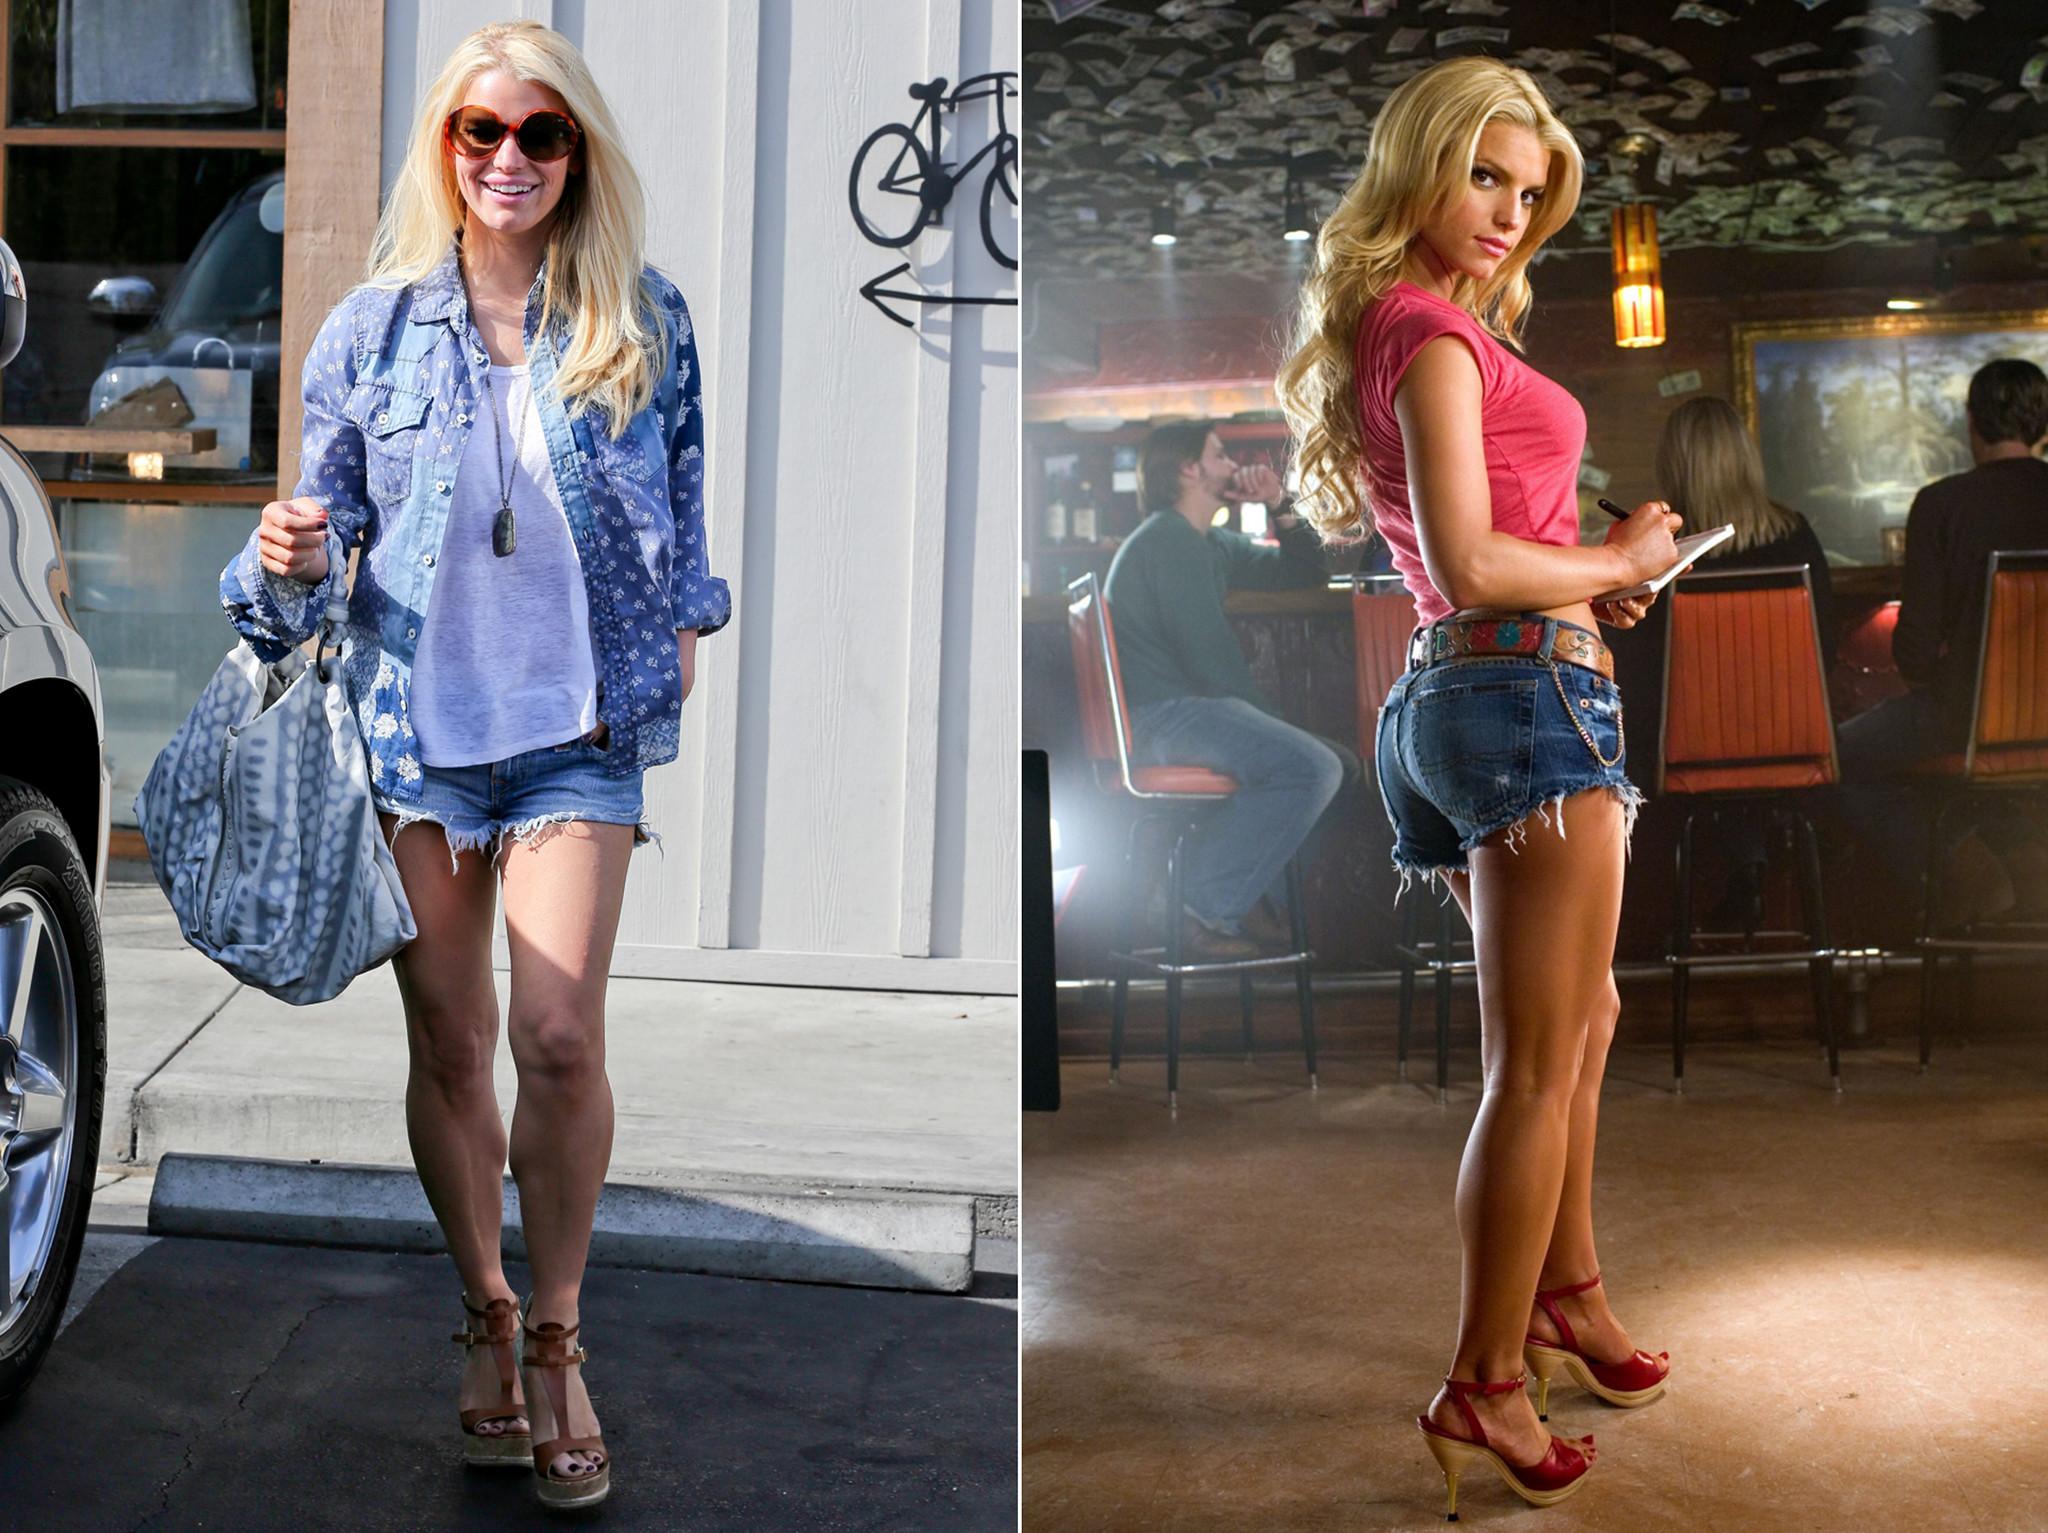 Jessica Simpson Daisy Duke Workout Secrets Revealed; New Mom Sizzles .